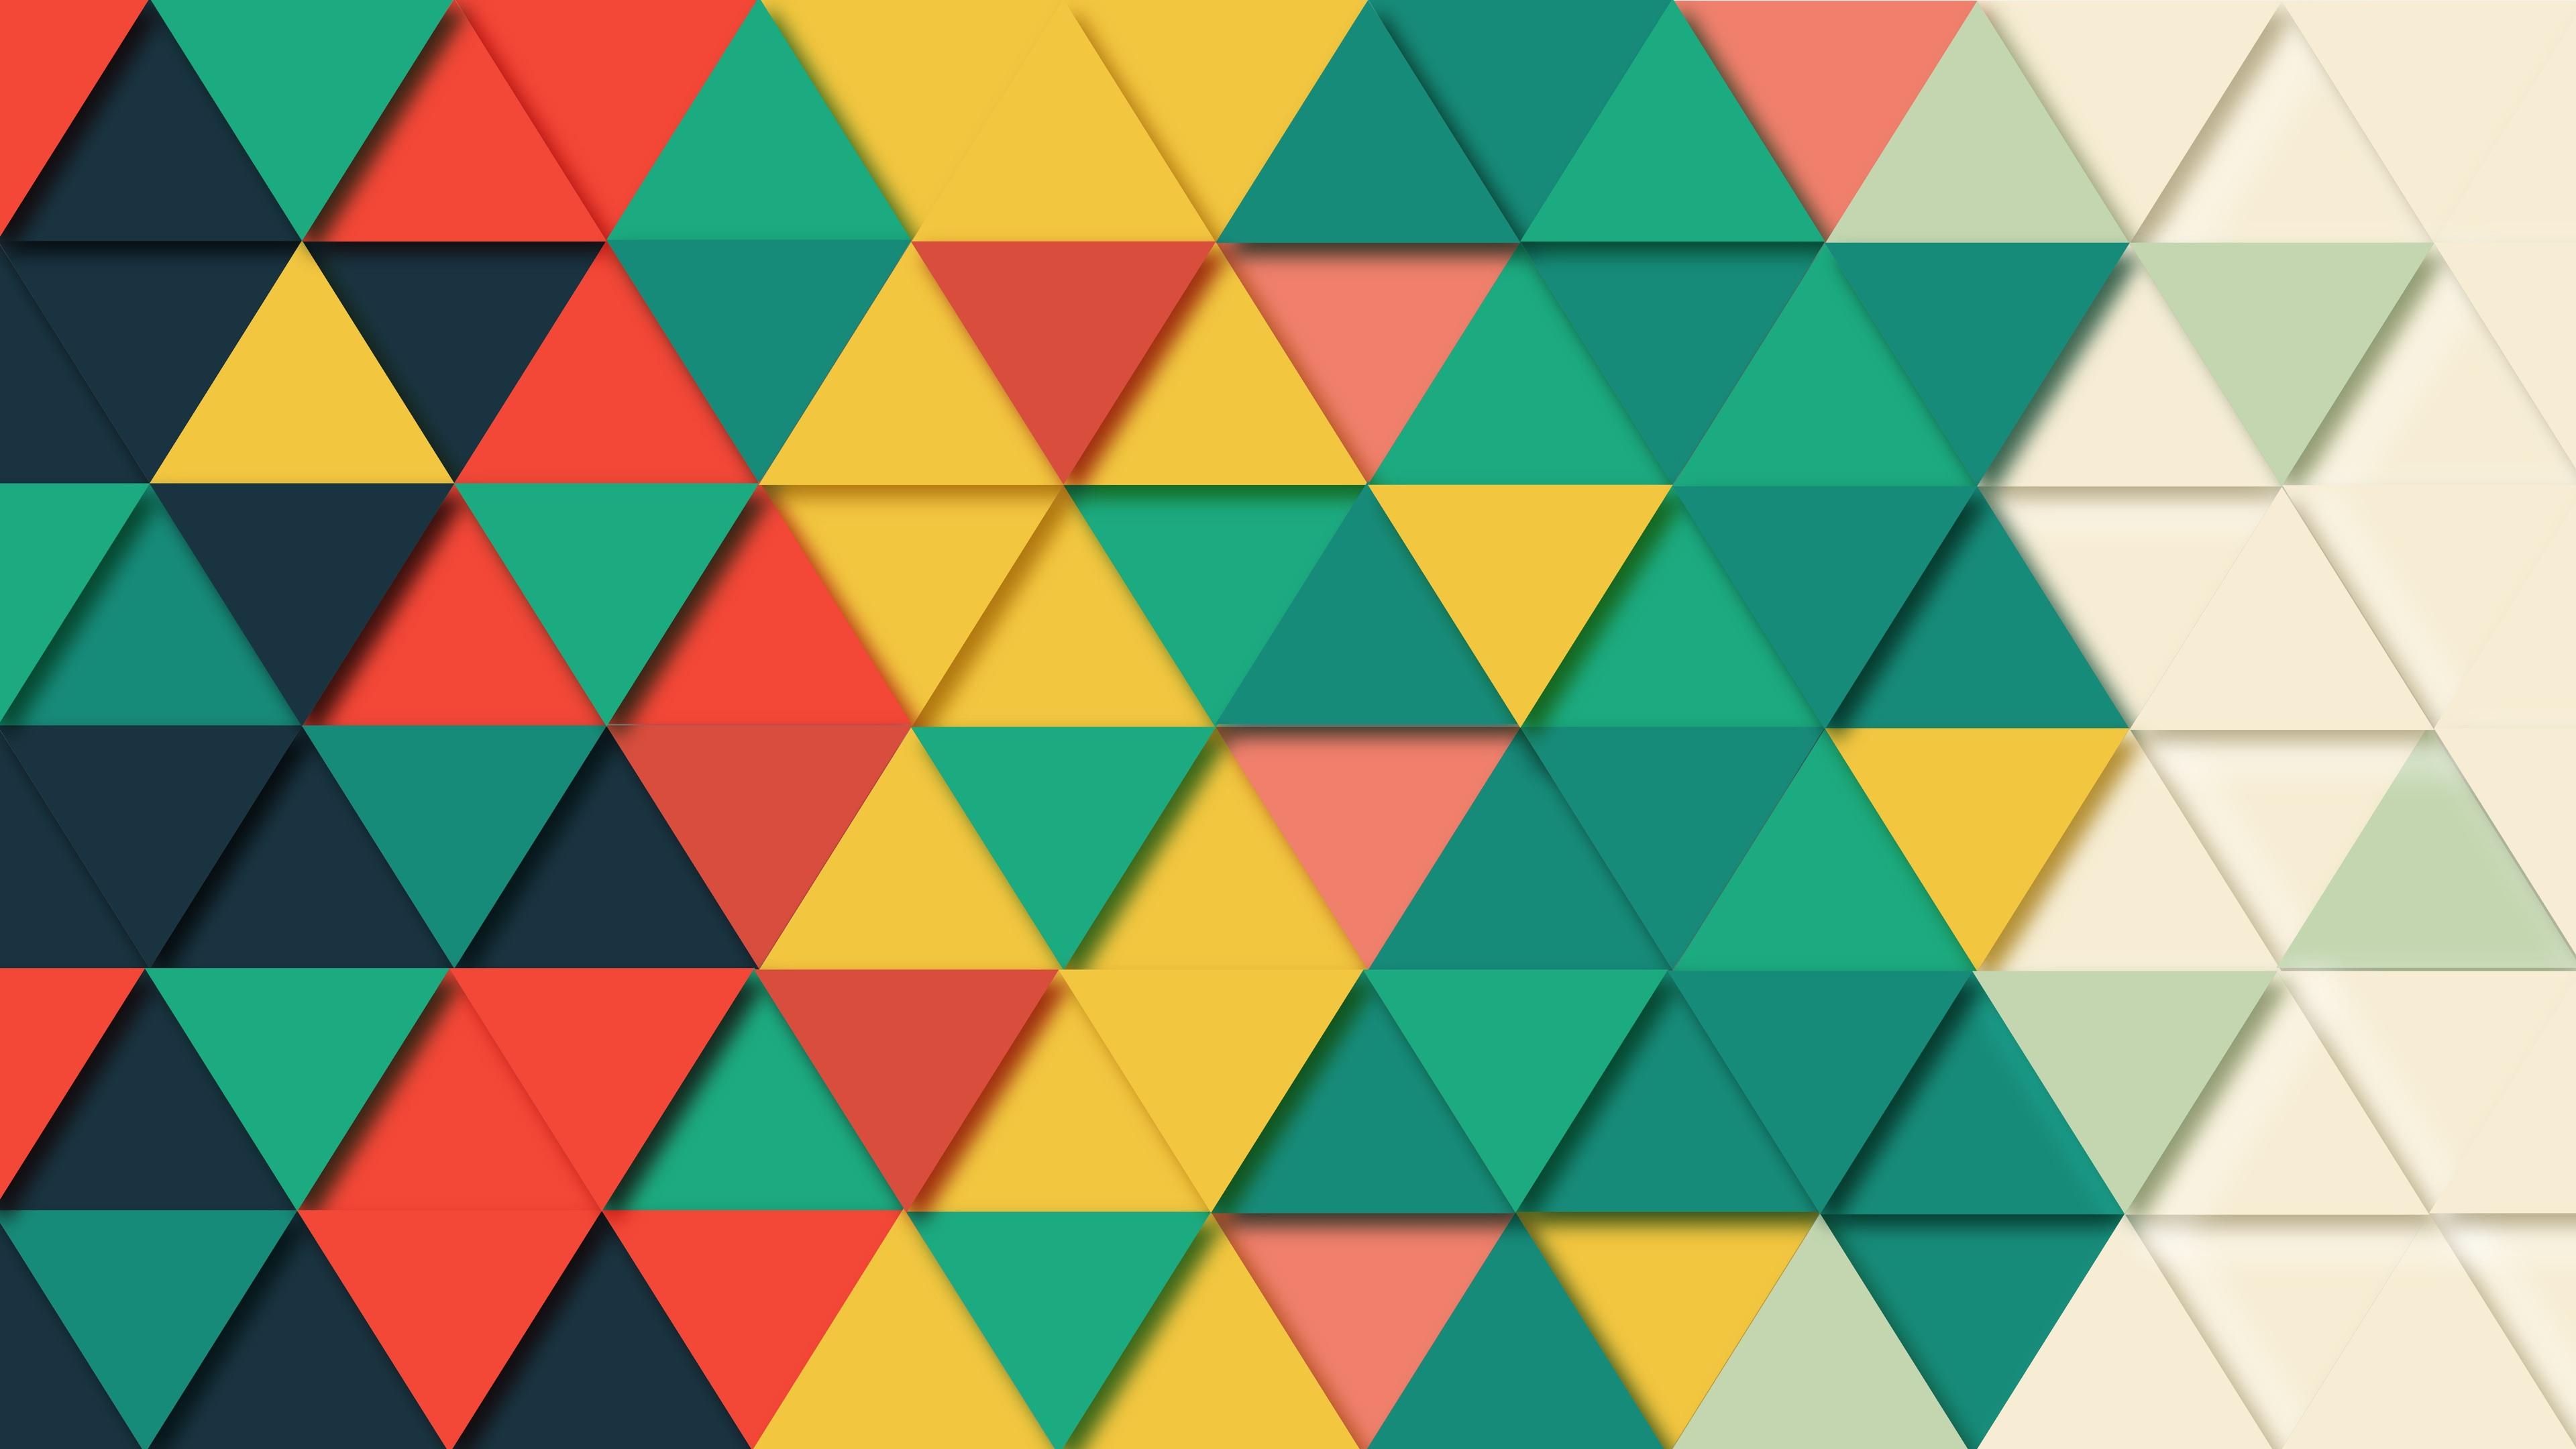 Background Geometric Triangle Pattern 4k - HD Wallpaper